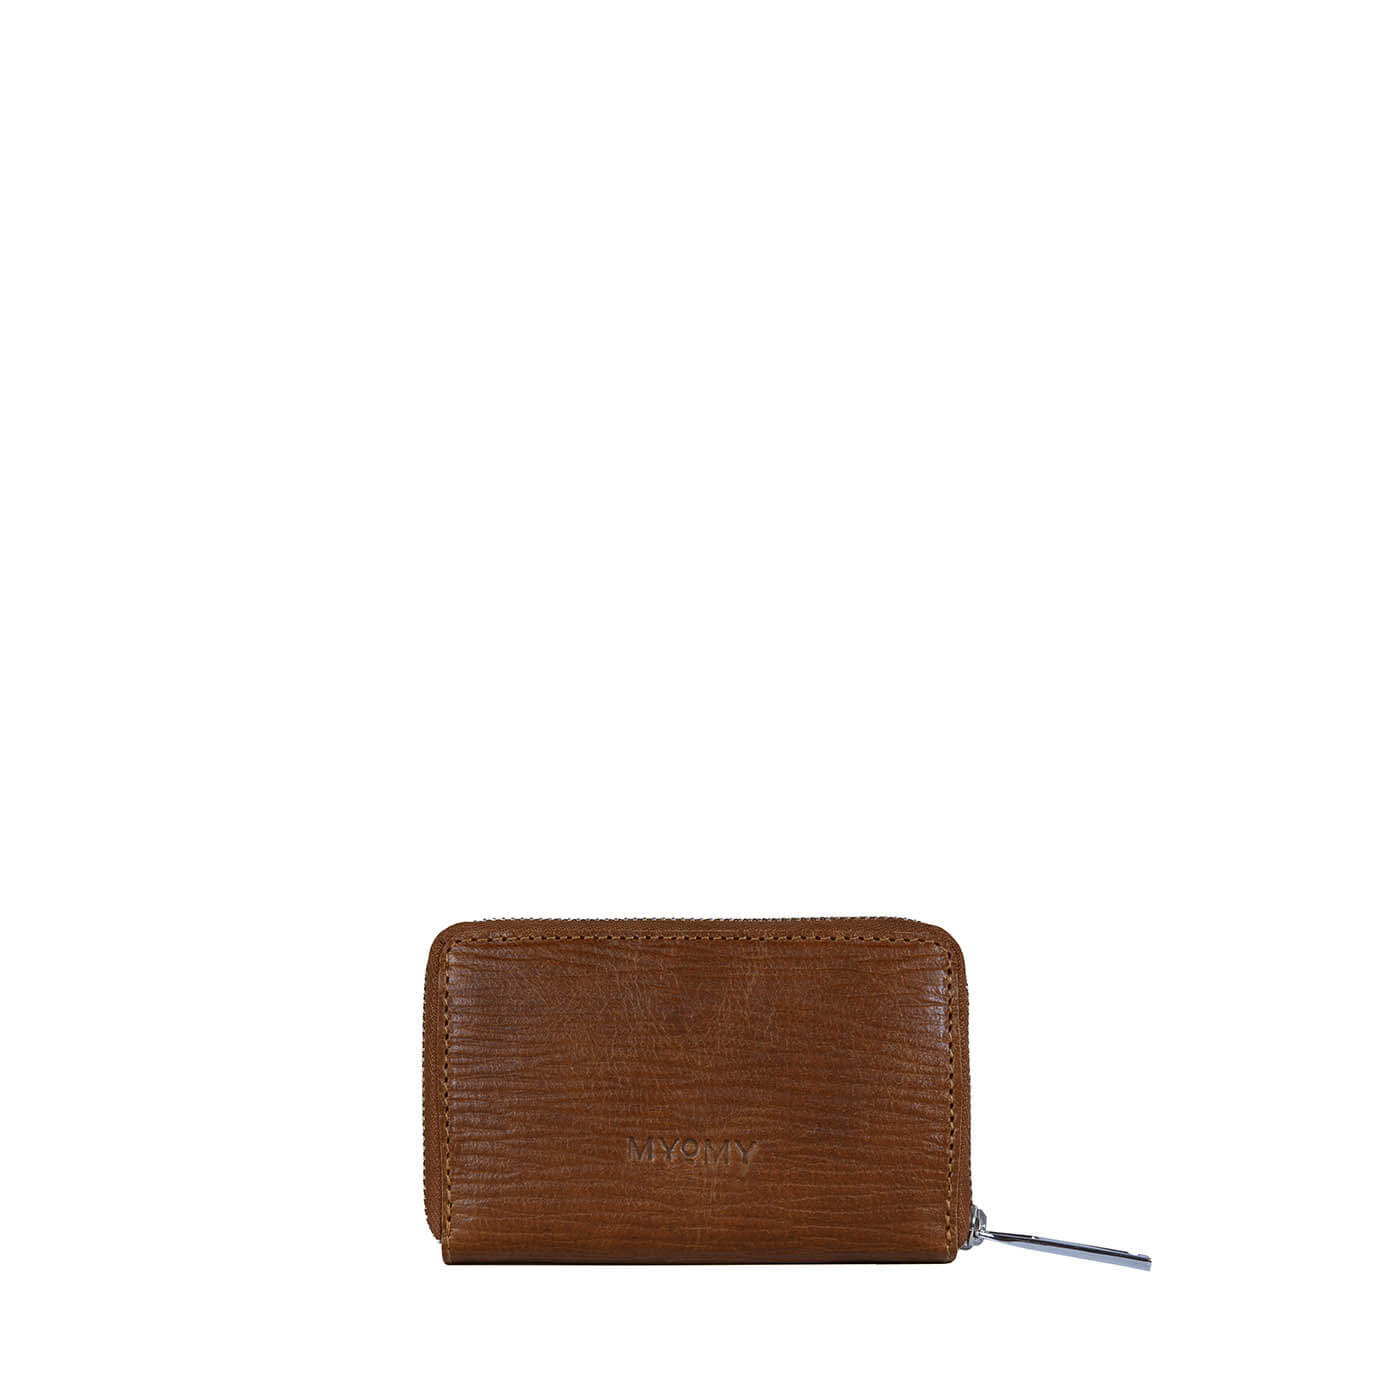 MY PAPER BAG Wallet Medium (RFID) - boarded original